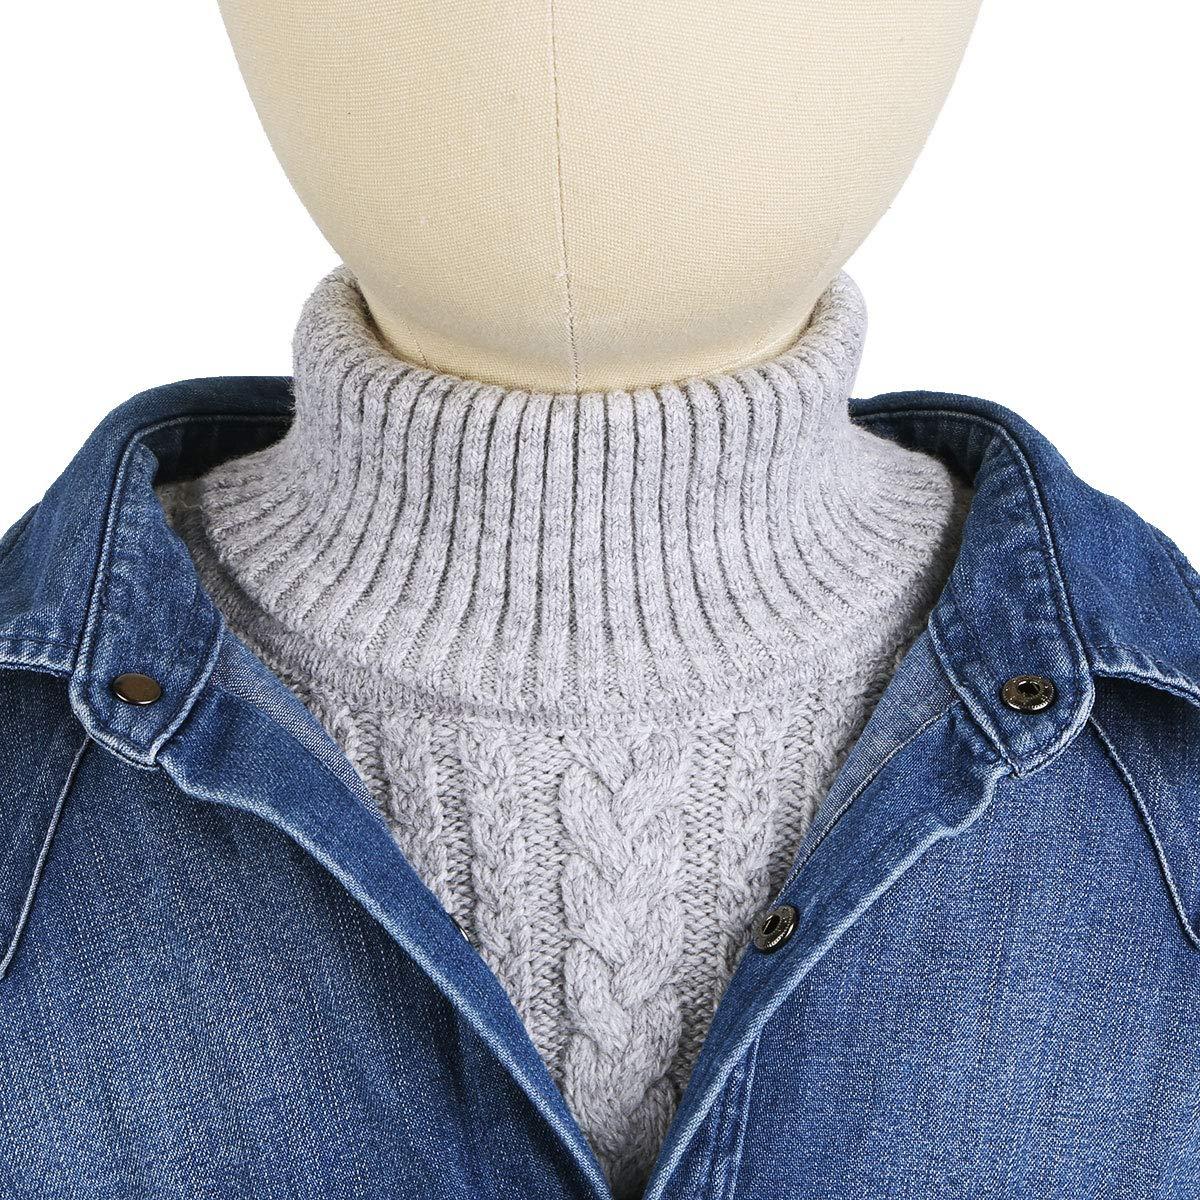 TiaoBug Children Turtleneck Dicky Mock Neck Gaiter Scarf Collar Baby Warmer Sweater Neck Cover Grey One Size